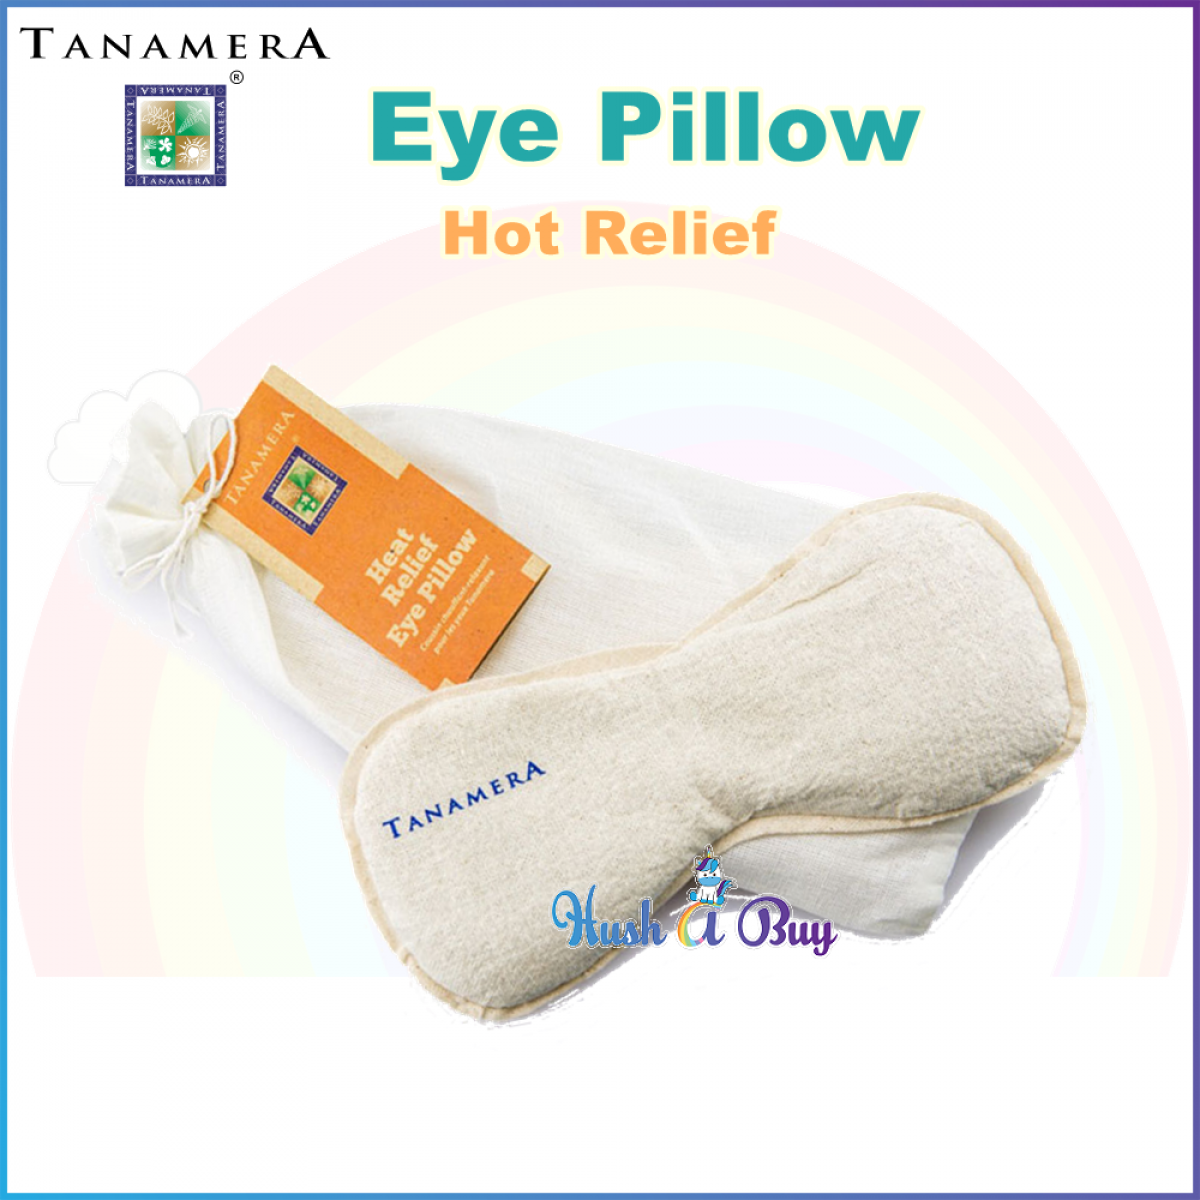 Tanamera Eye Pillow